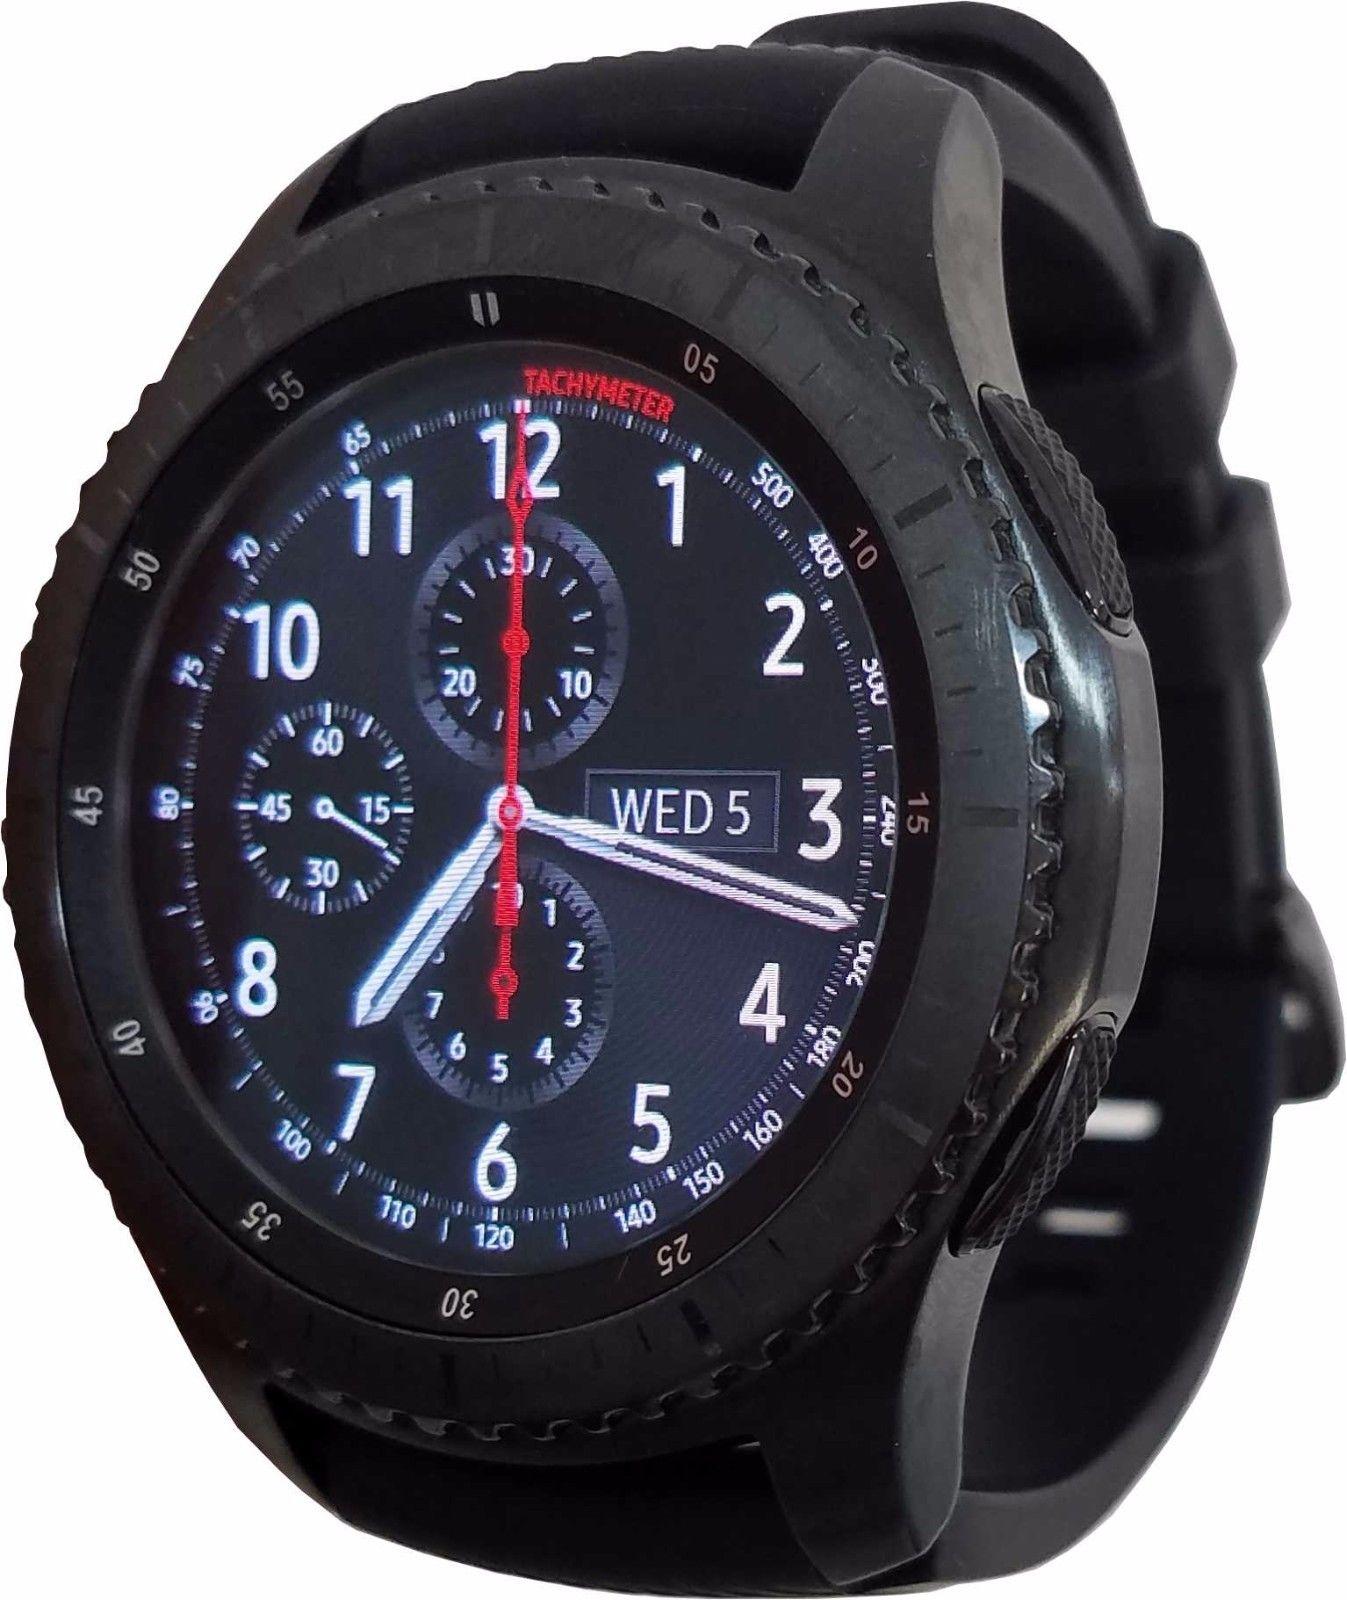 Samsung Galaxy Gear S3 Frontier Smartwatch. $235 + FS (eBay Daily Deal)